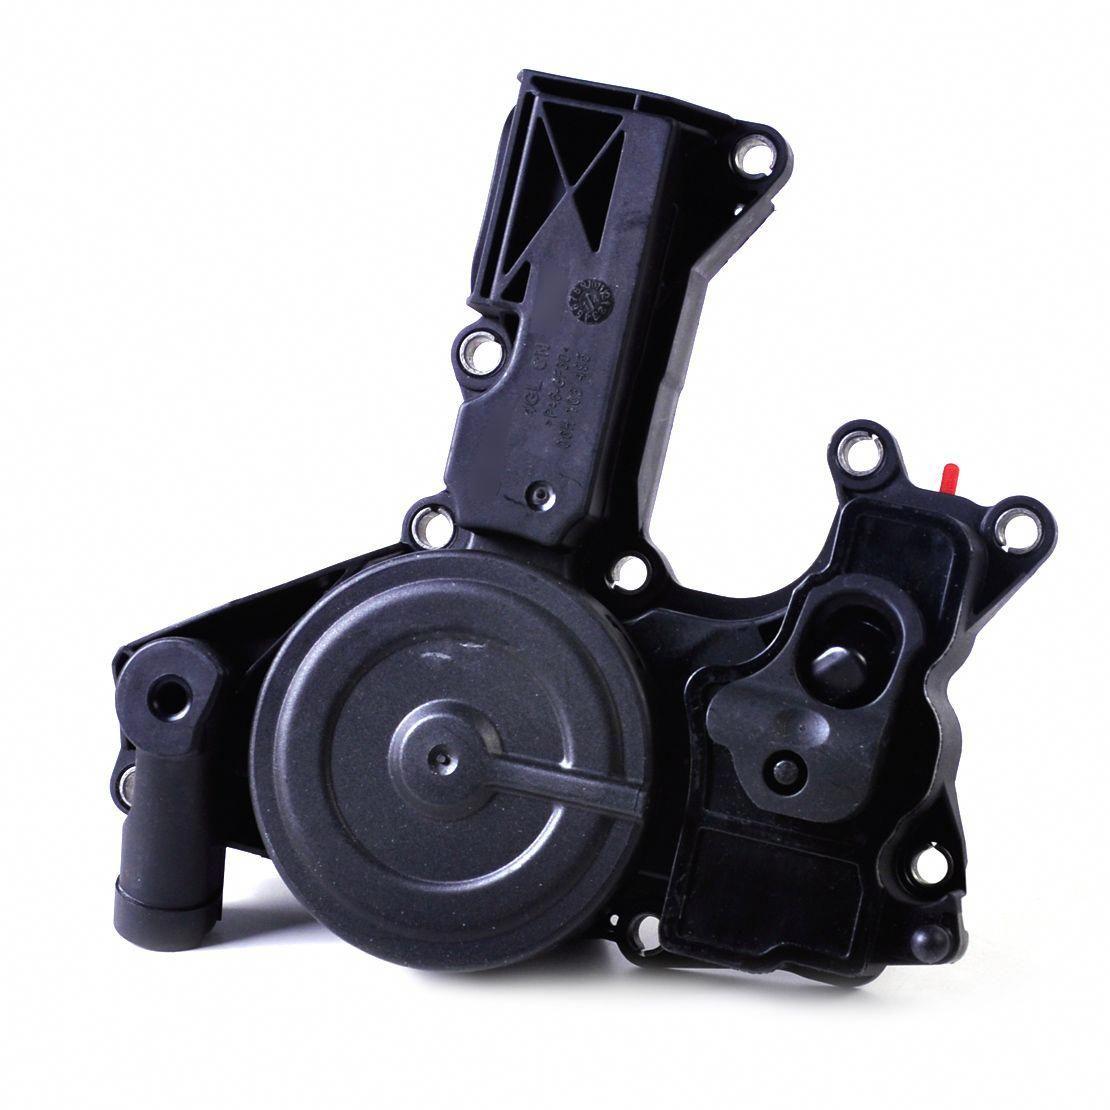 New 1pc Black Oil Separator Pcv Valve Assembly Fit 06h 103 495 B For Audi A3 Tt A4 A5 Quattro Q5 For Vw Tiguan Cc Golf Gti Jetta V Volkswagen Audi